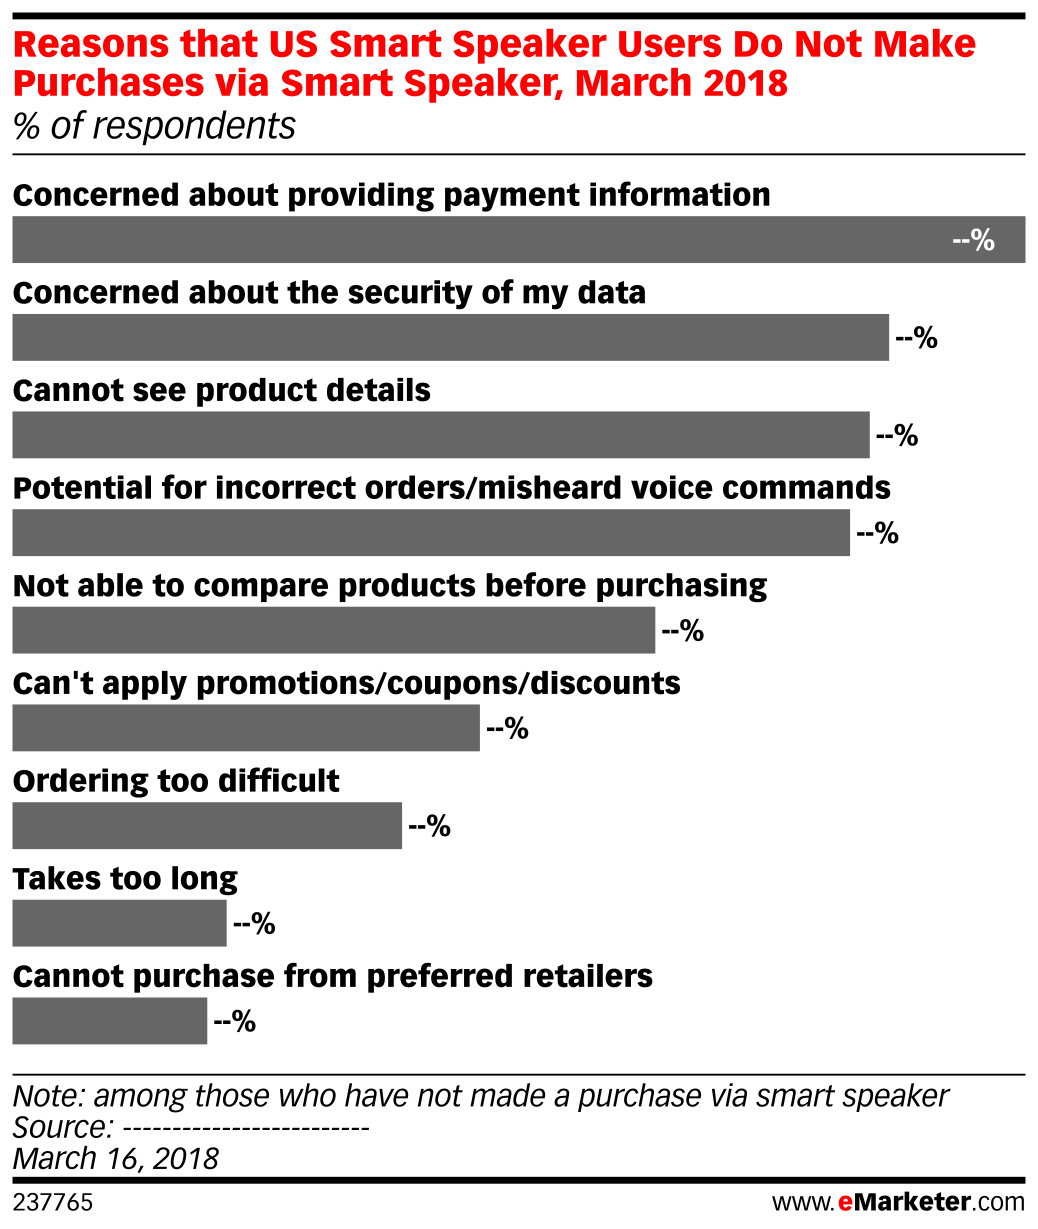 Reasons that US Smart Speaker Users Do Not Make Purchases via Smart Speaker, March 2018 (% of respondents)